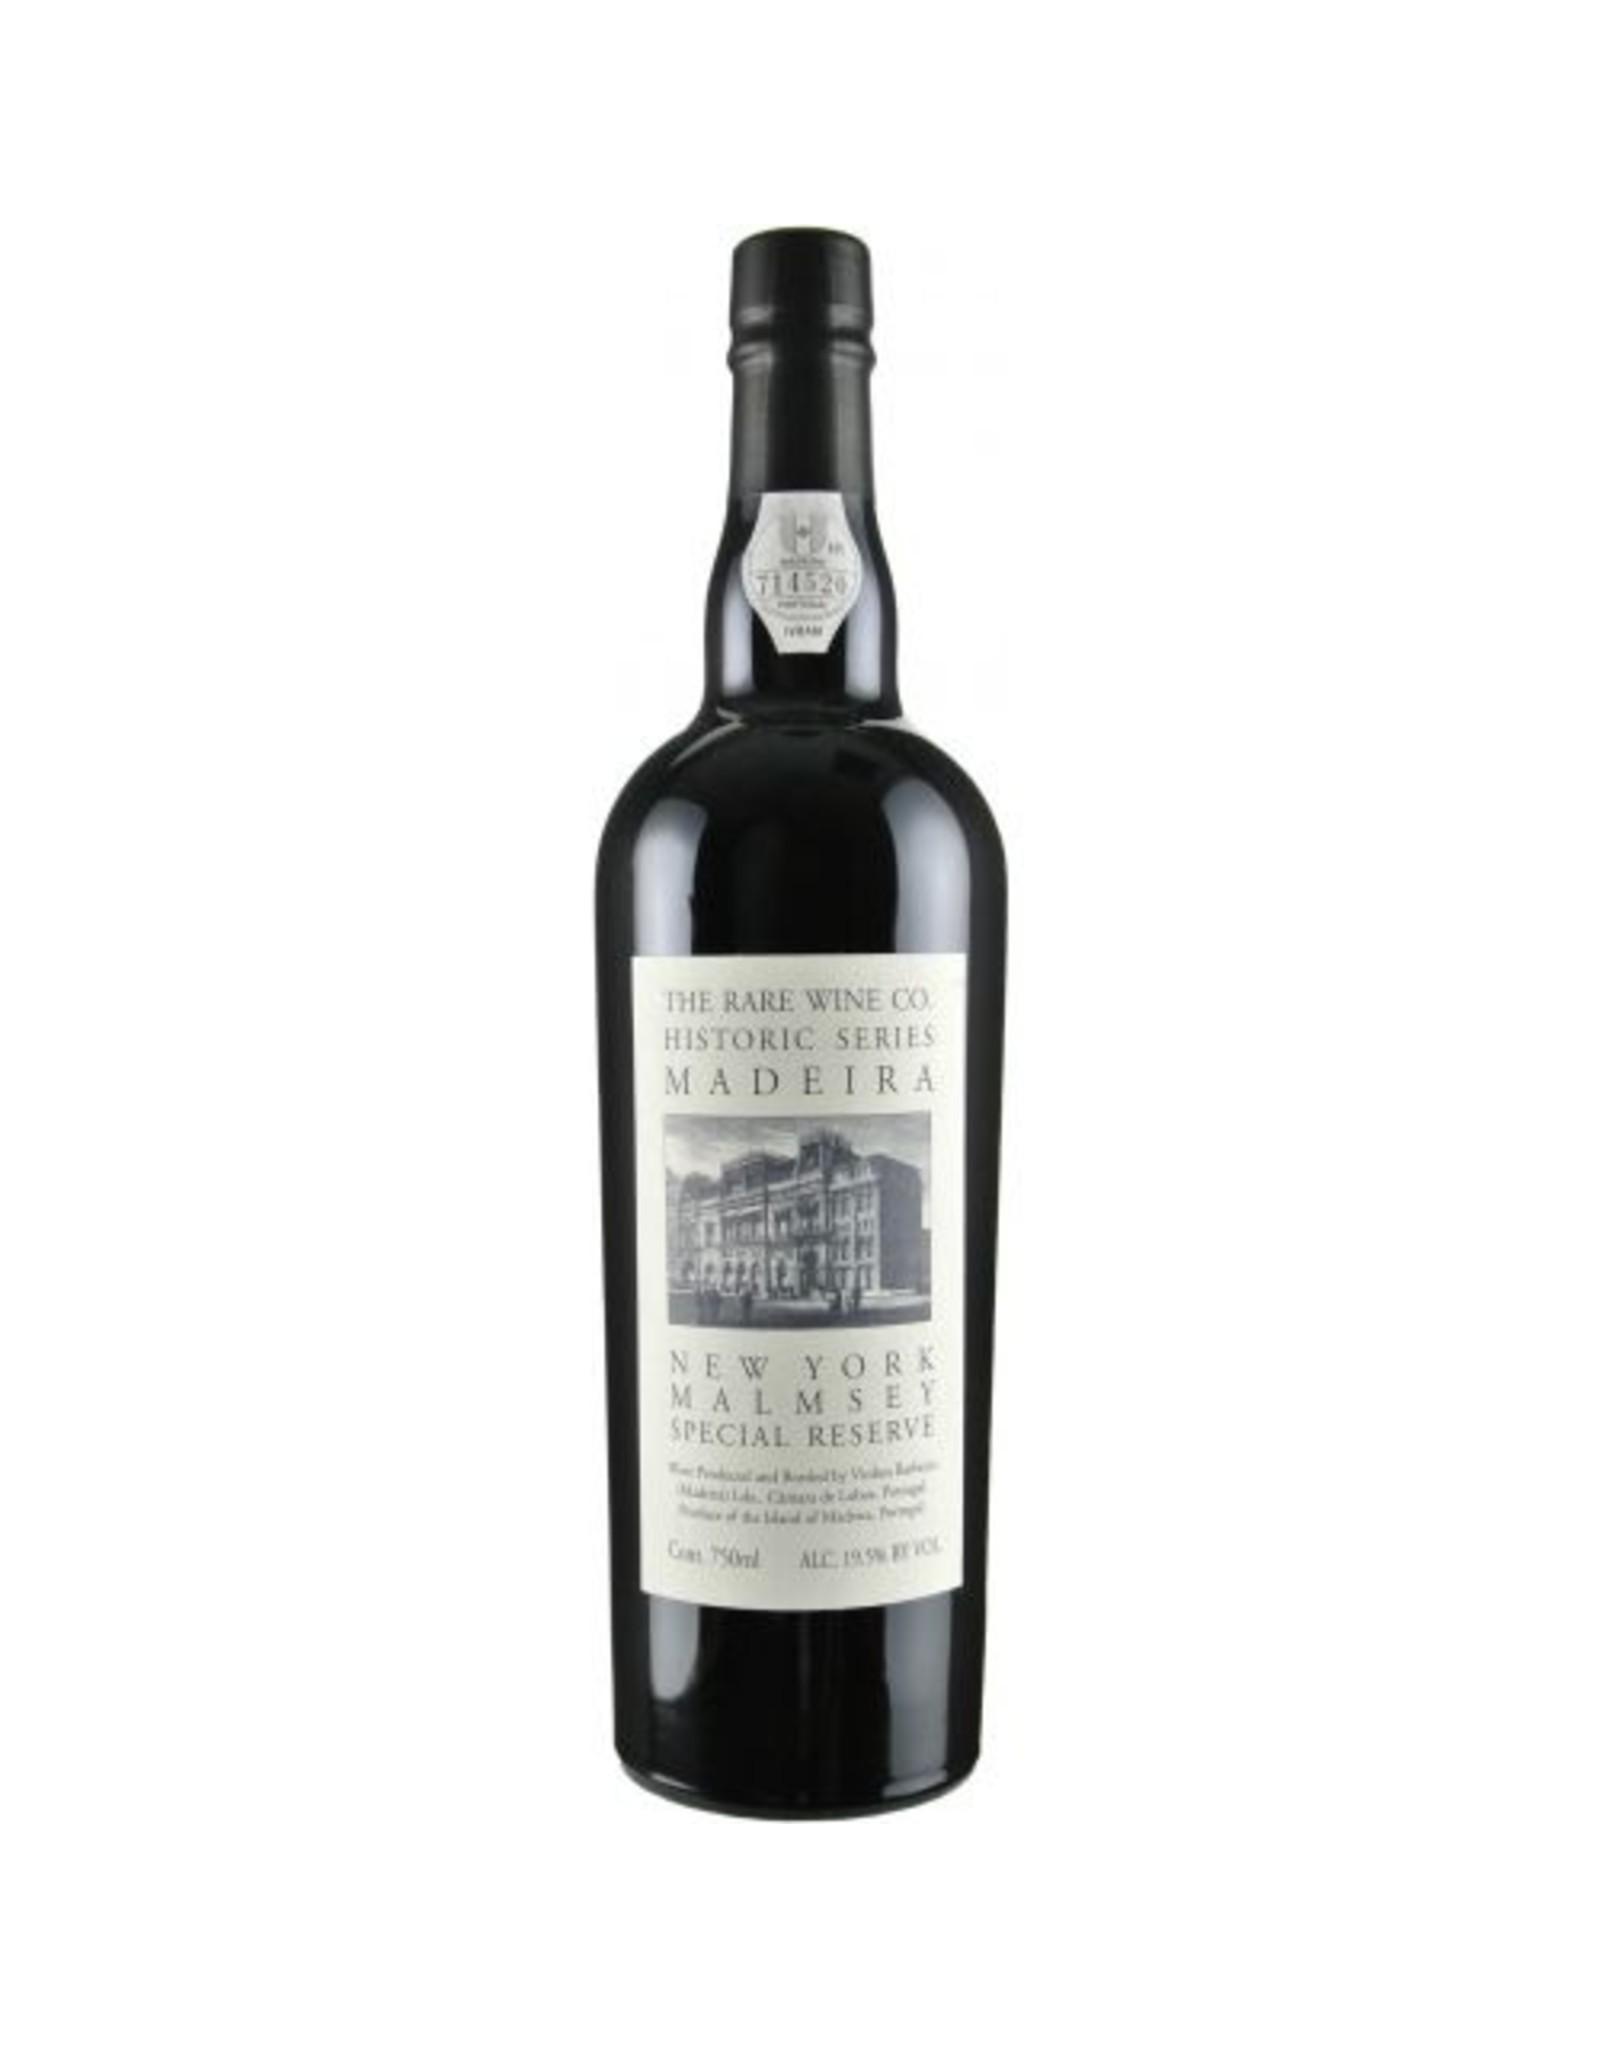 Rare Wine Co. Historic Series New York Malmsey Madeira